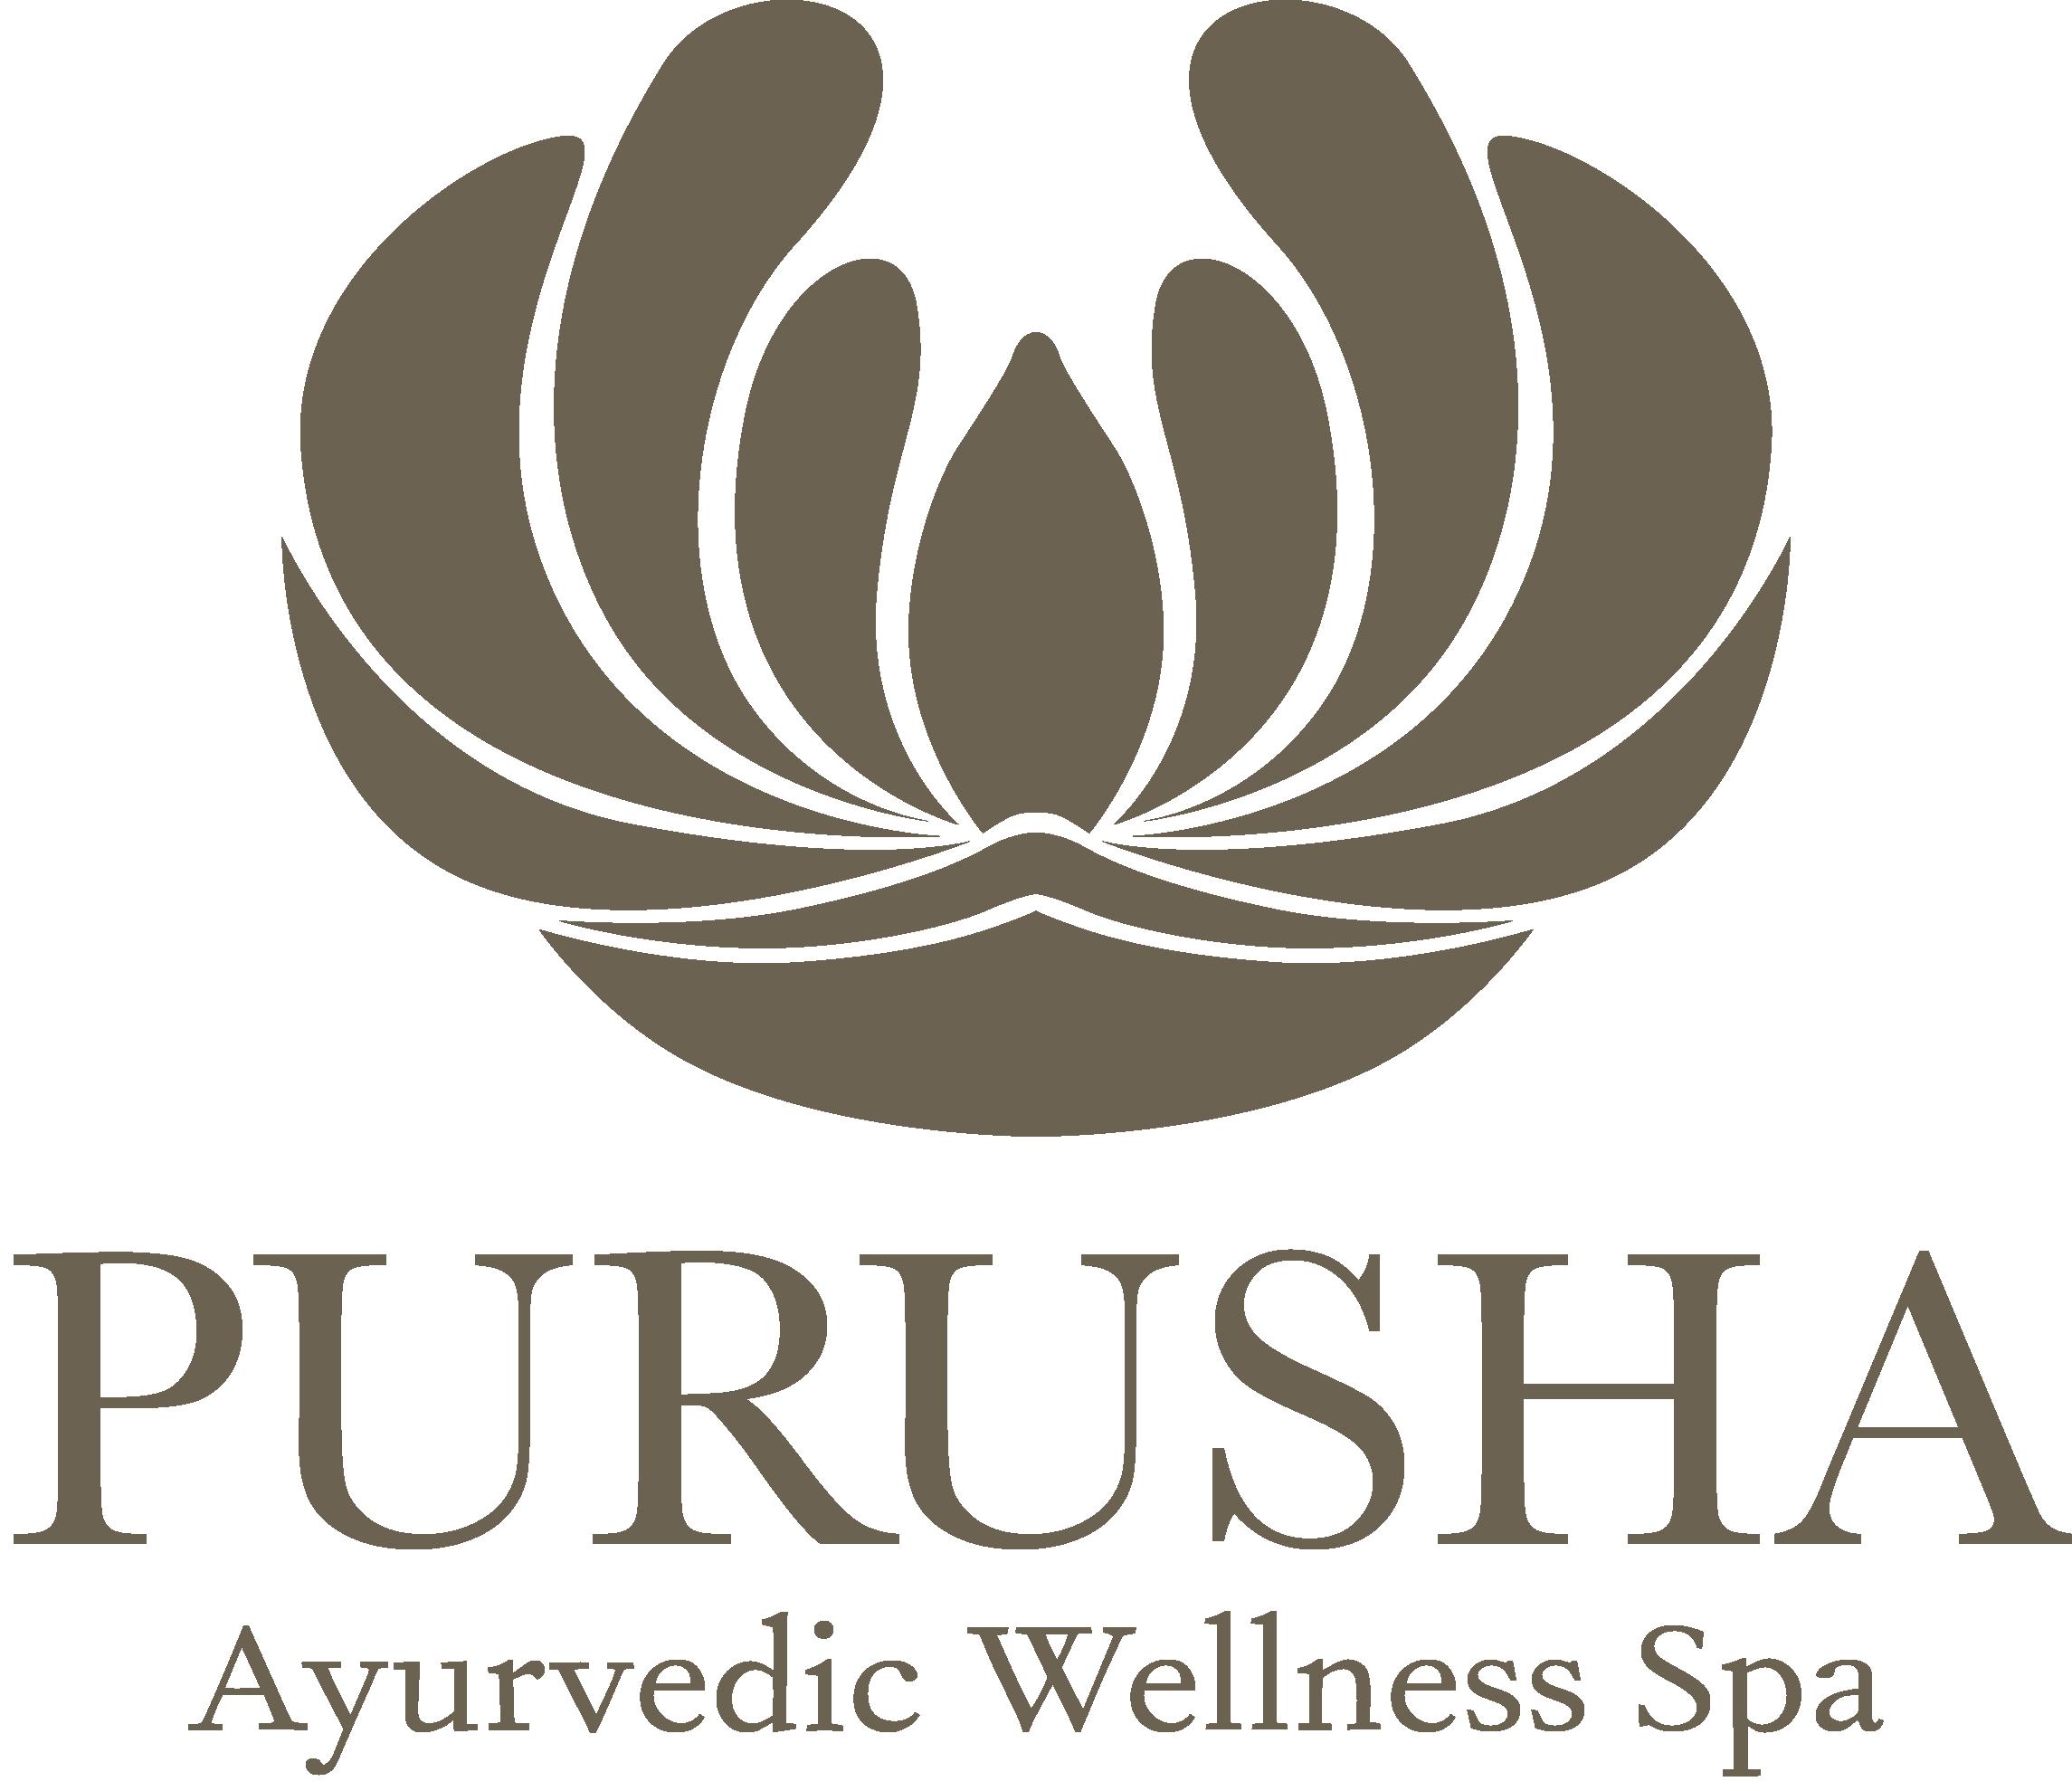 logo purusha-1.png